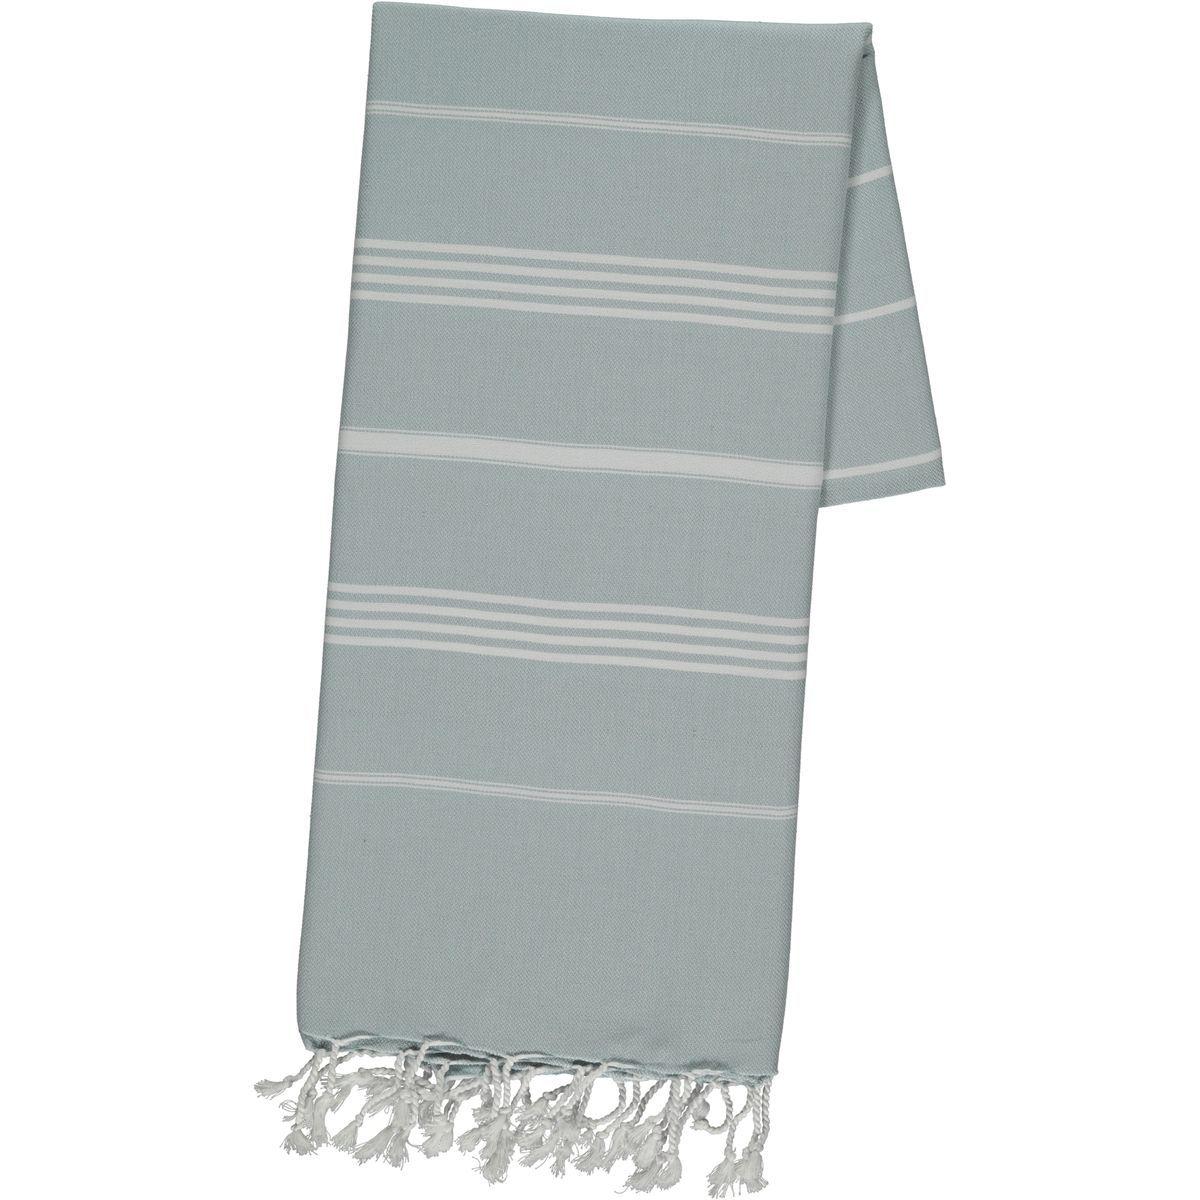 Peshtemal Leyla - Light Blue